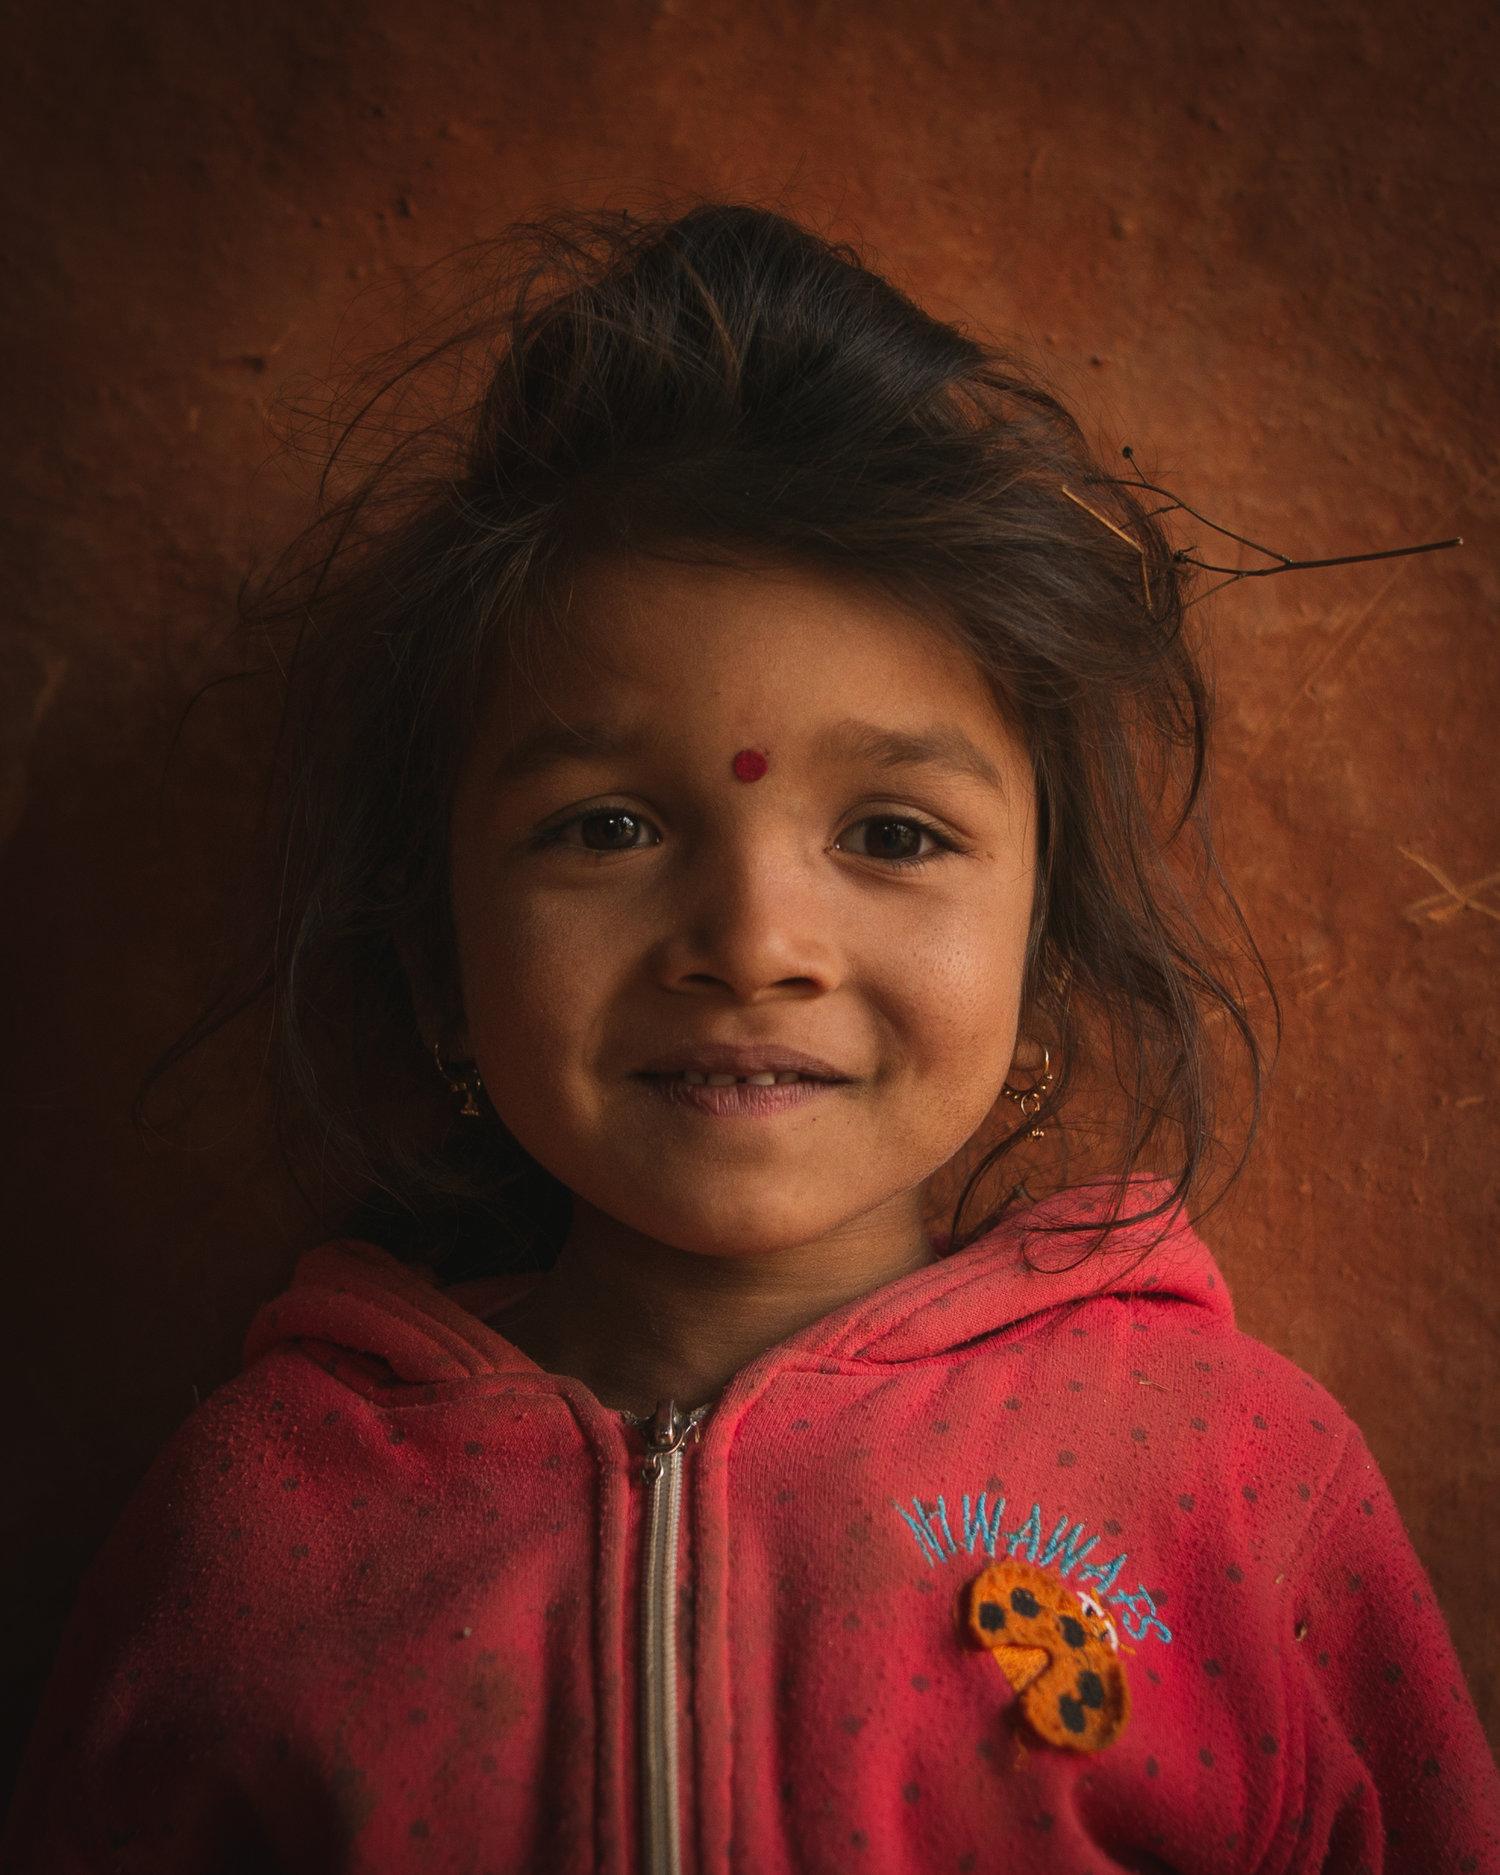 Monika Untouchable Nepal THISWORLDEXISTS